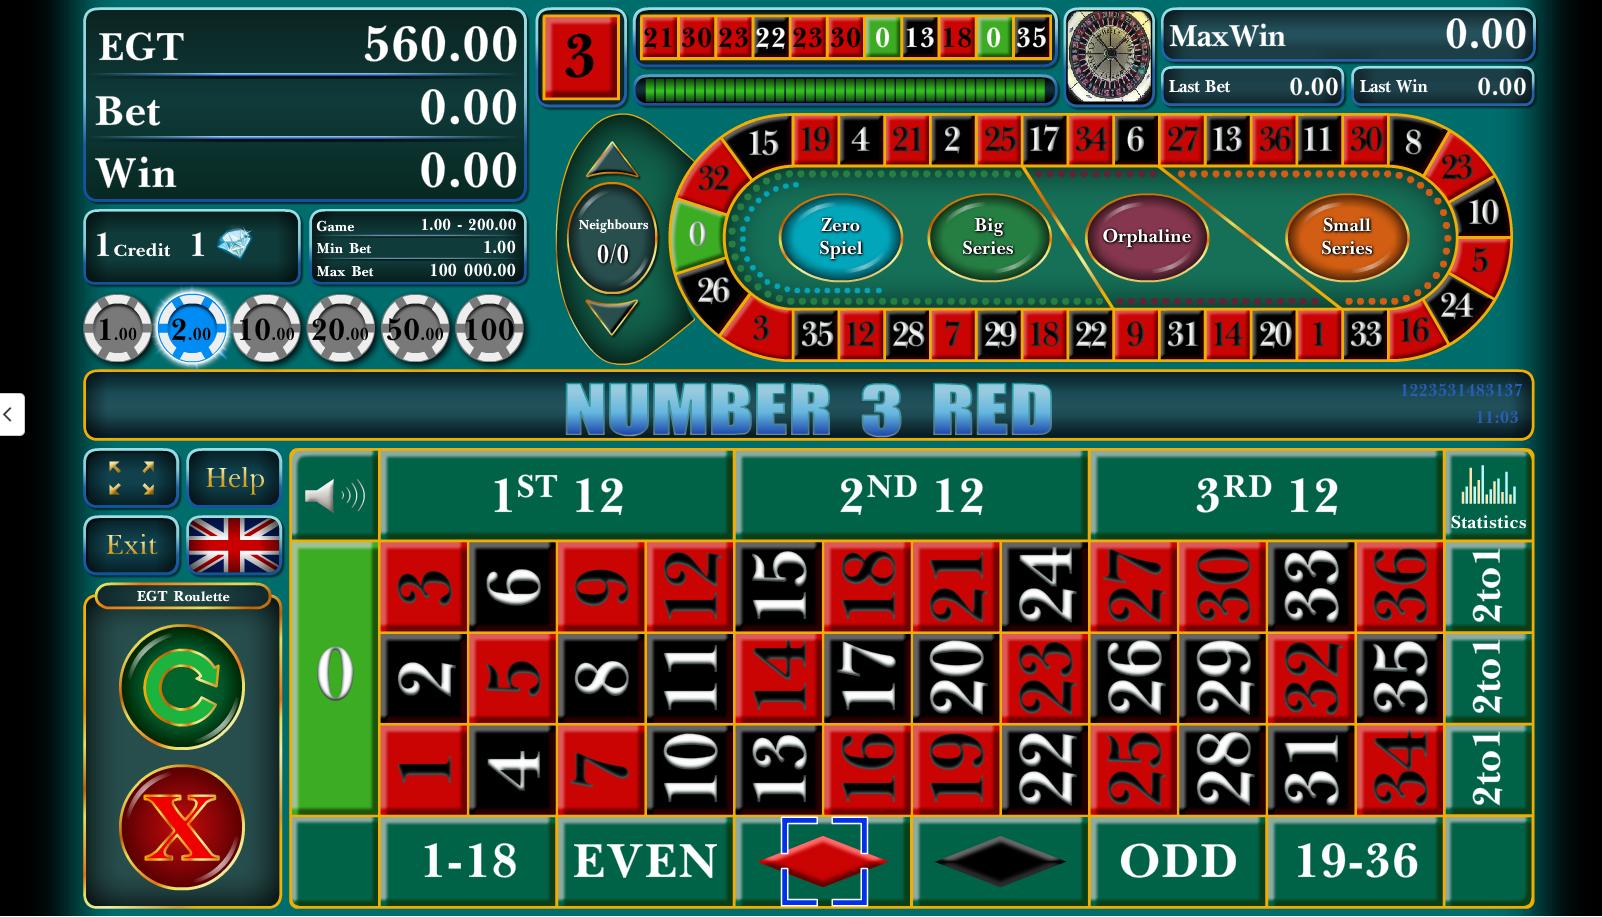 royal vegas online casino download european roulette